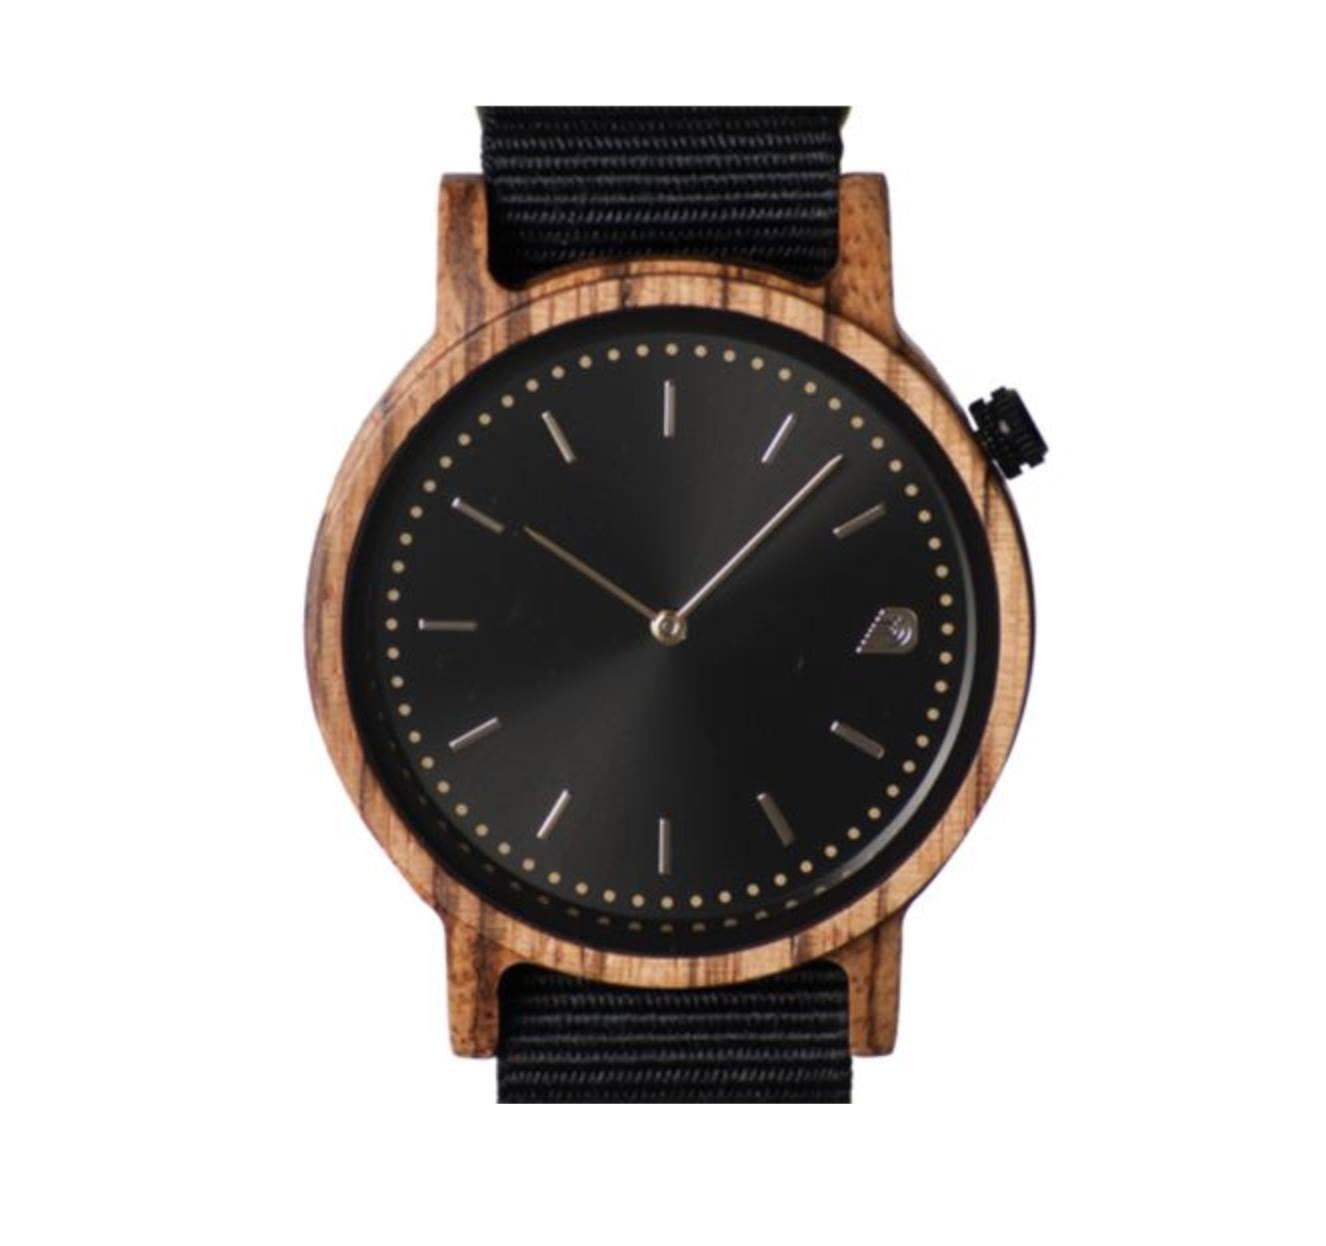 Stylish Wooden Frame Watch